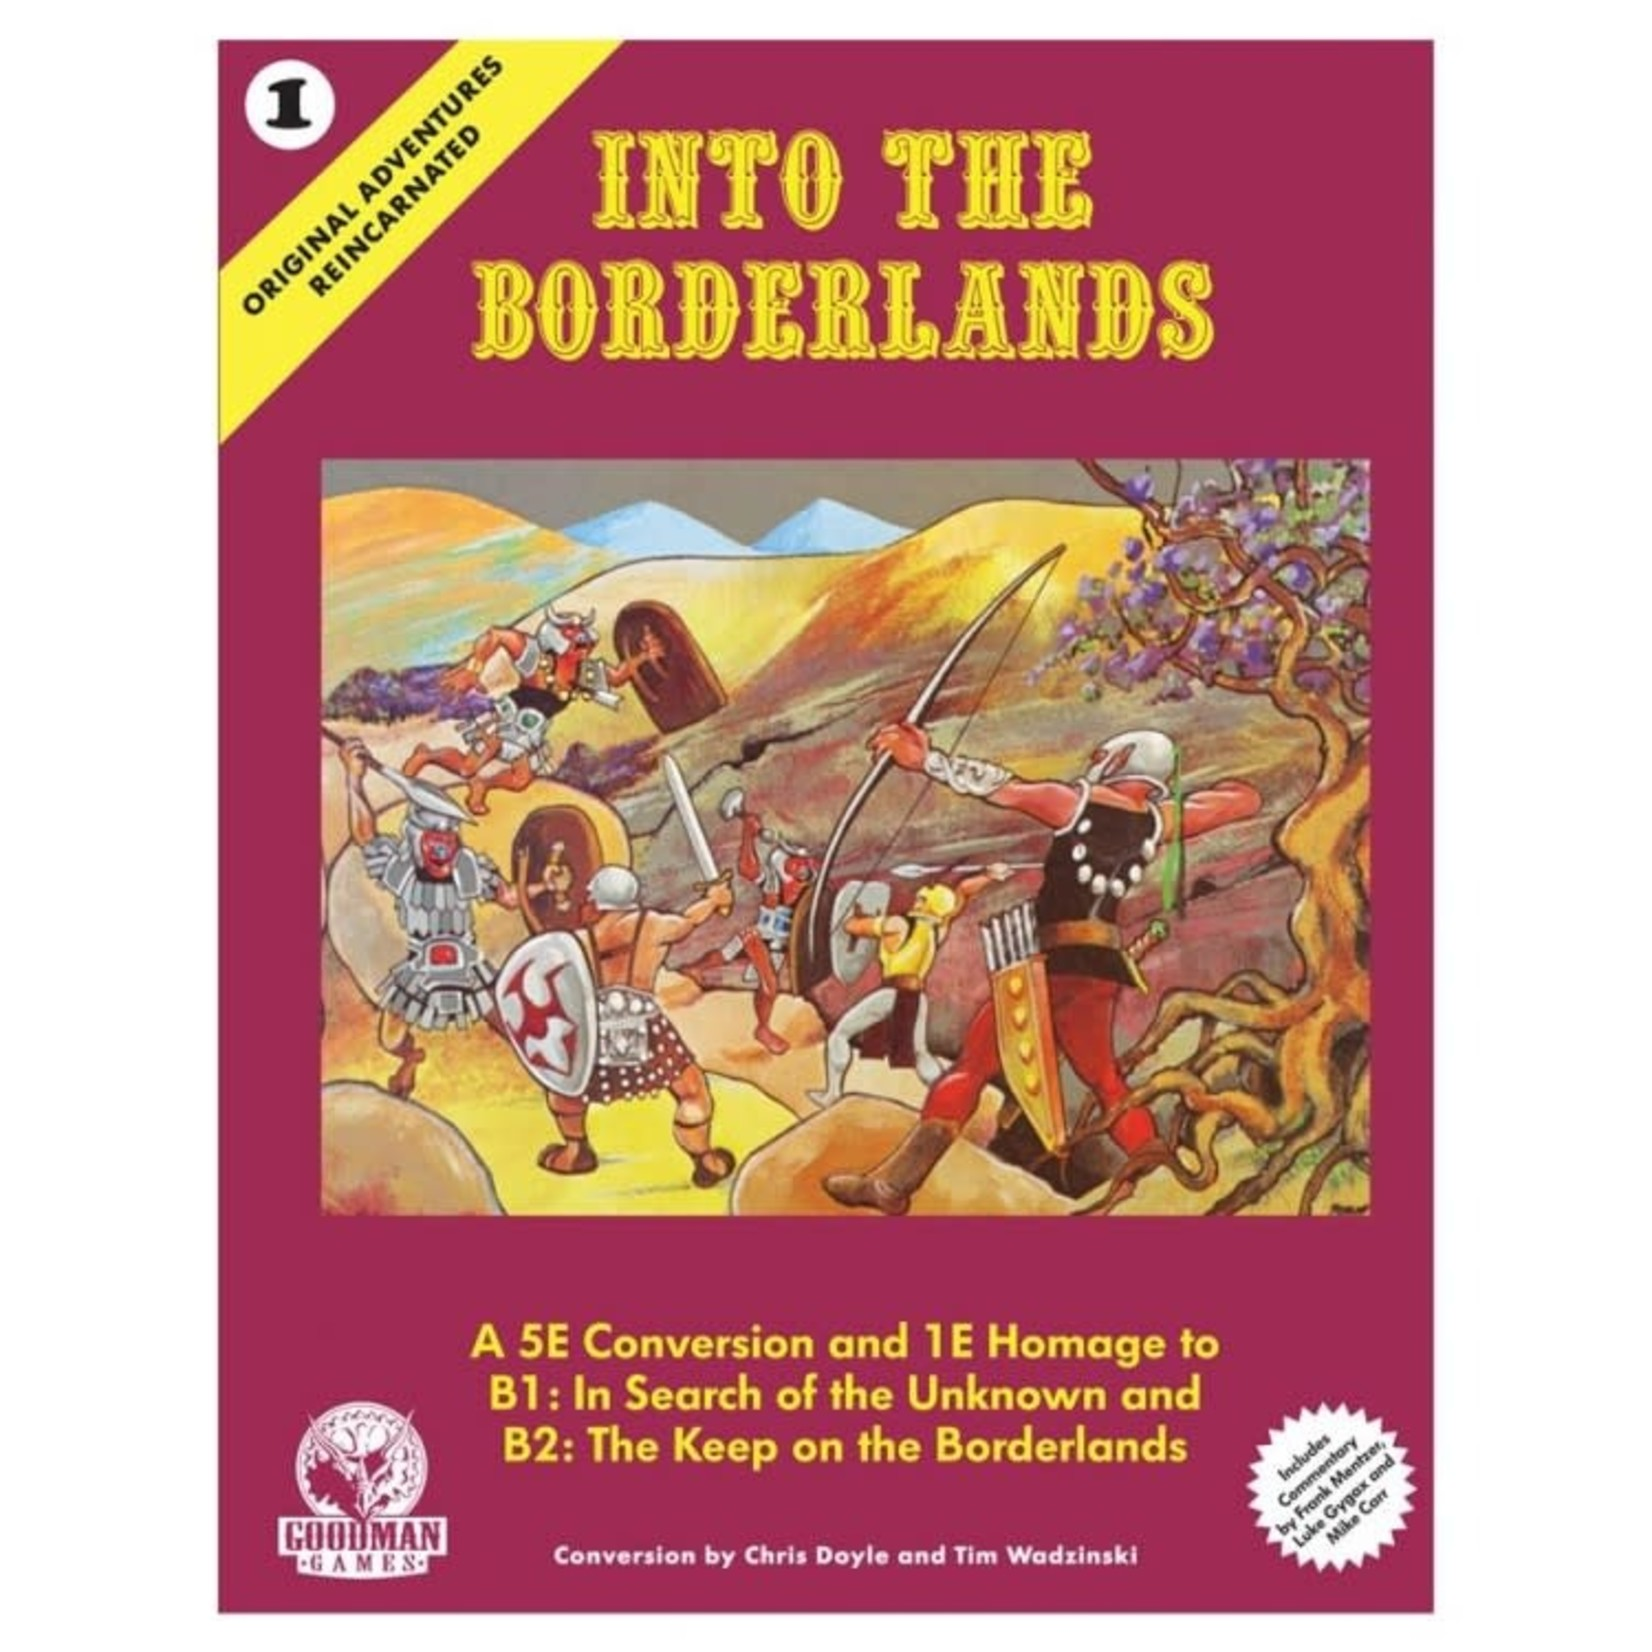 Goodman Games Original Adventures Reincarnated #1: Into the Borderlands Hardcover